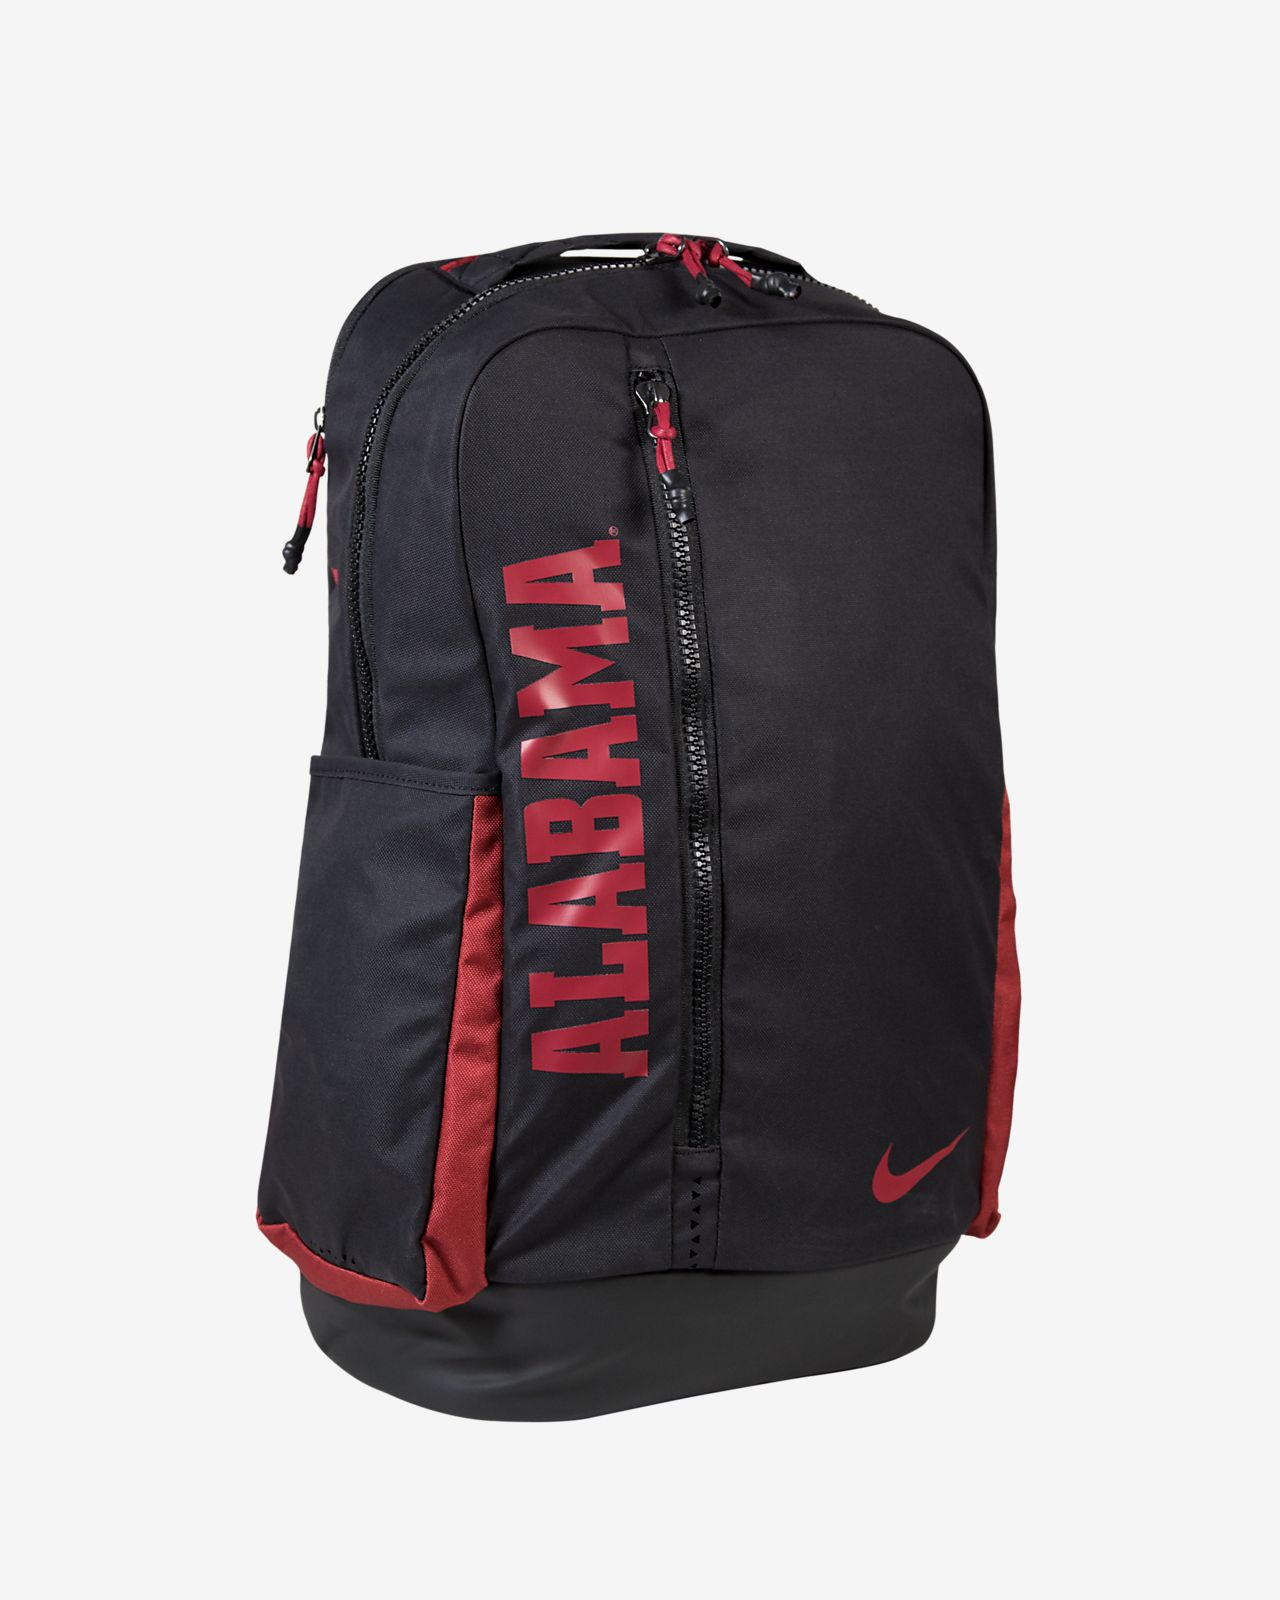 Nike College Vapor Power 2.0 (Alabama) Training Backpack